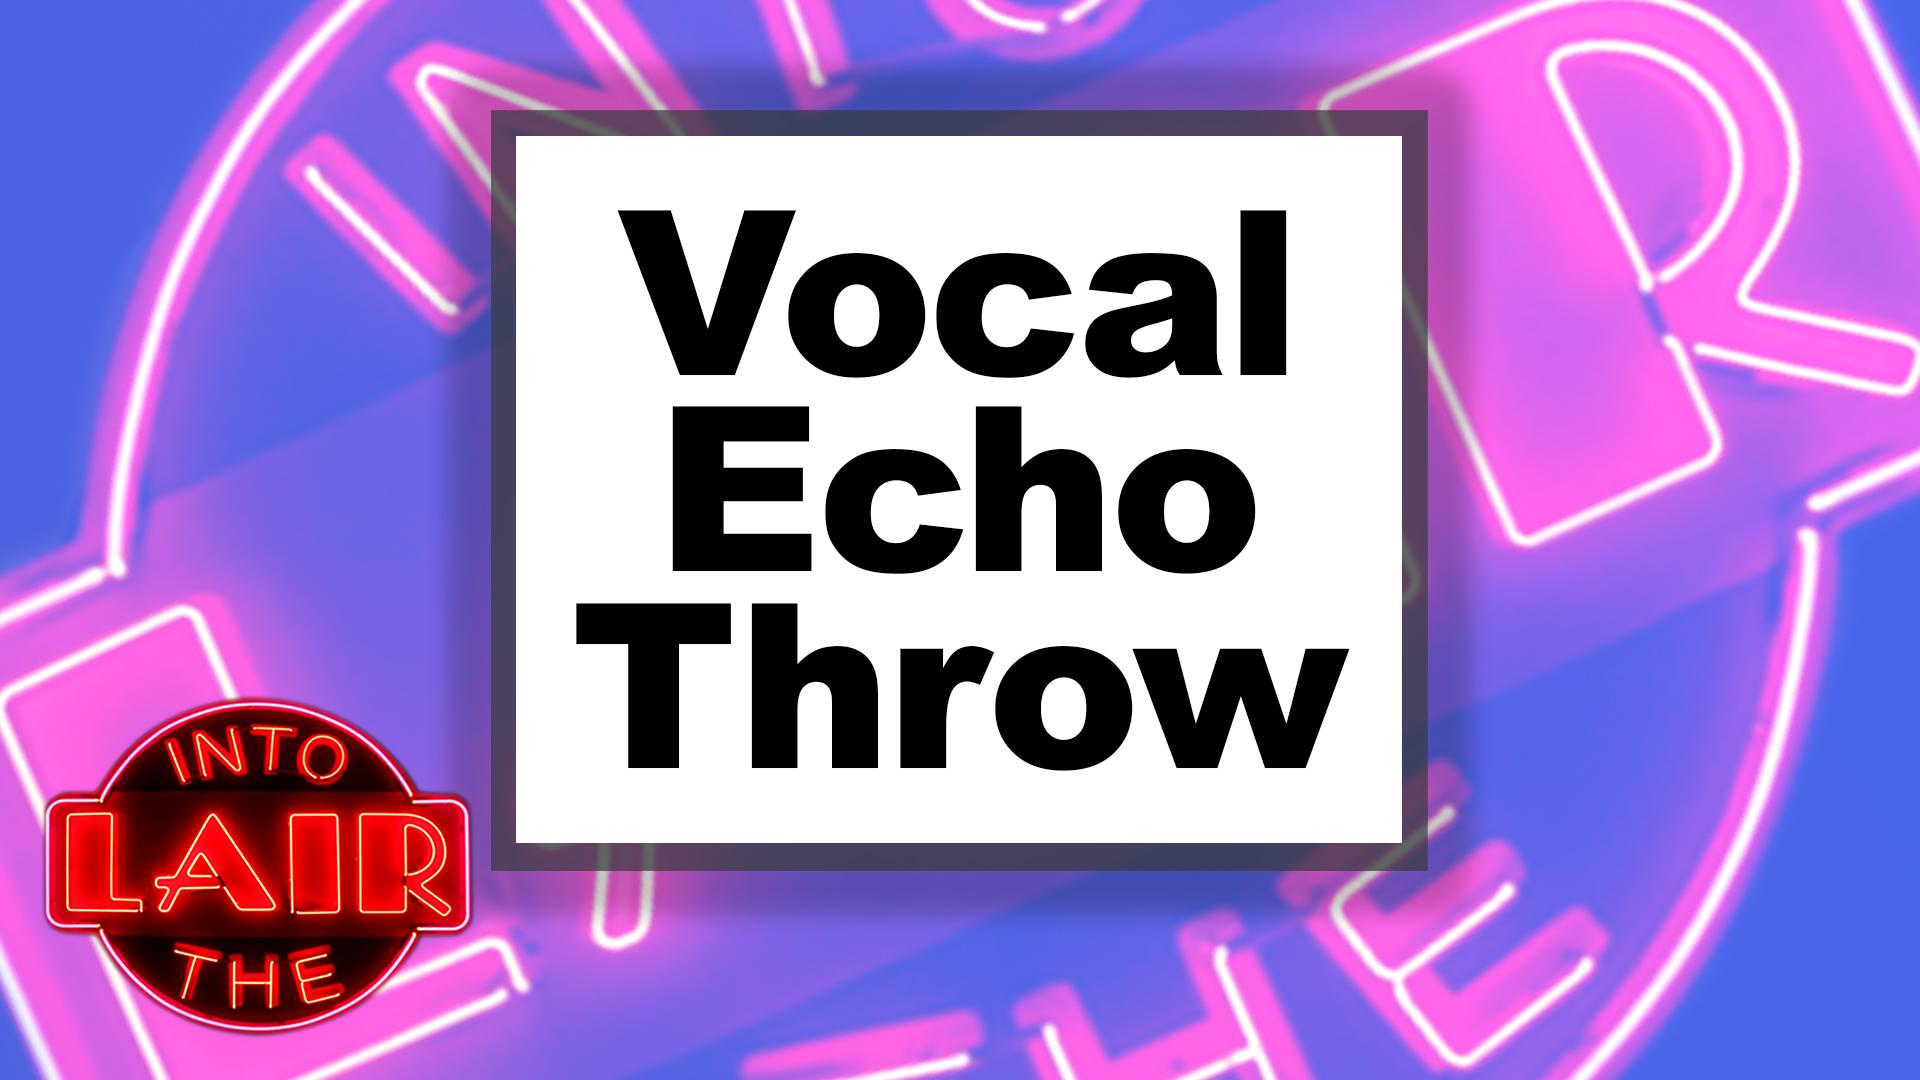 Vocal Echo Throw